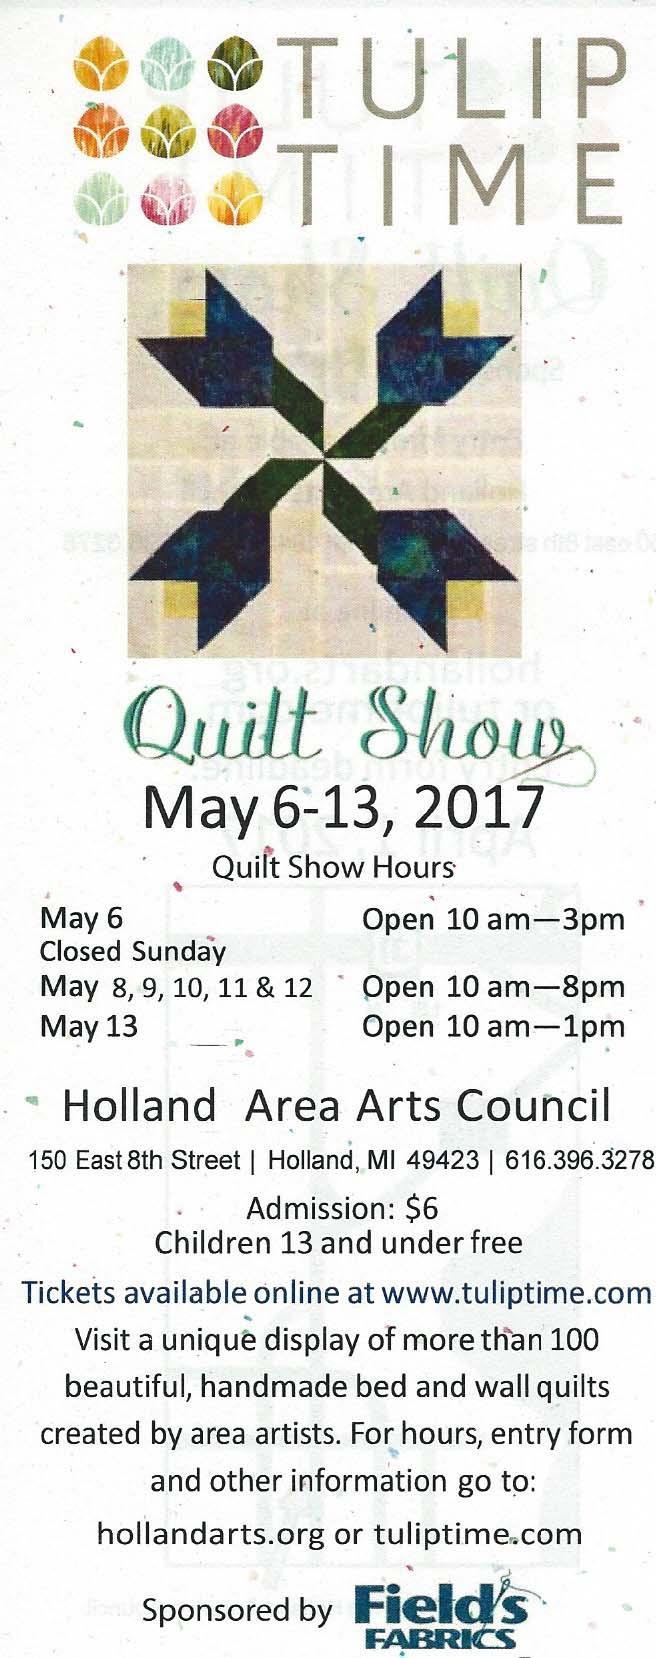 Area Quilt Events - Quilt Show - Tulip Time Quilt Show - 5/6/2017 ... : quilt show calendar - Adamdwight.com